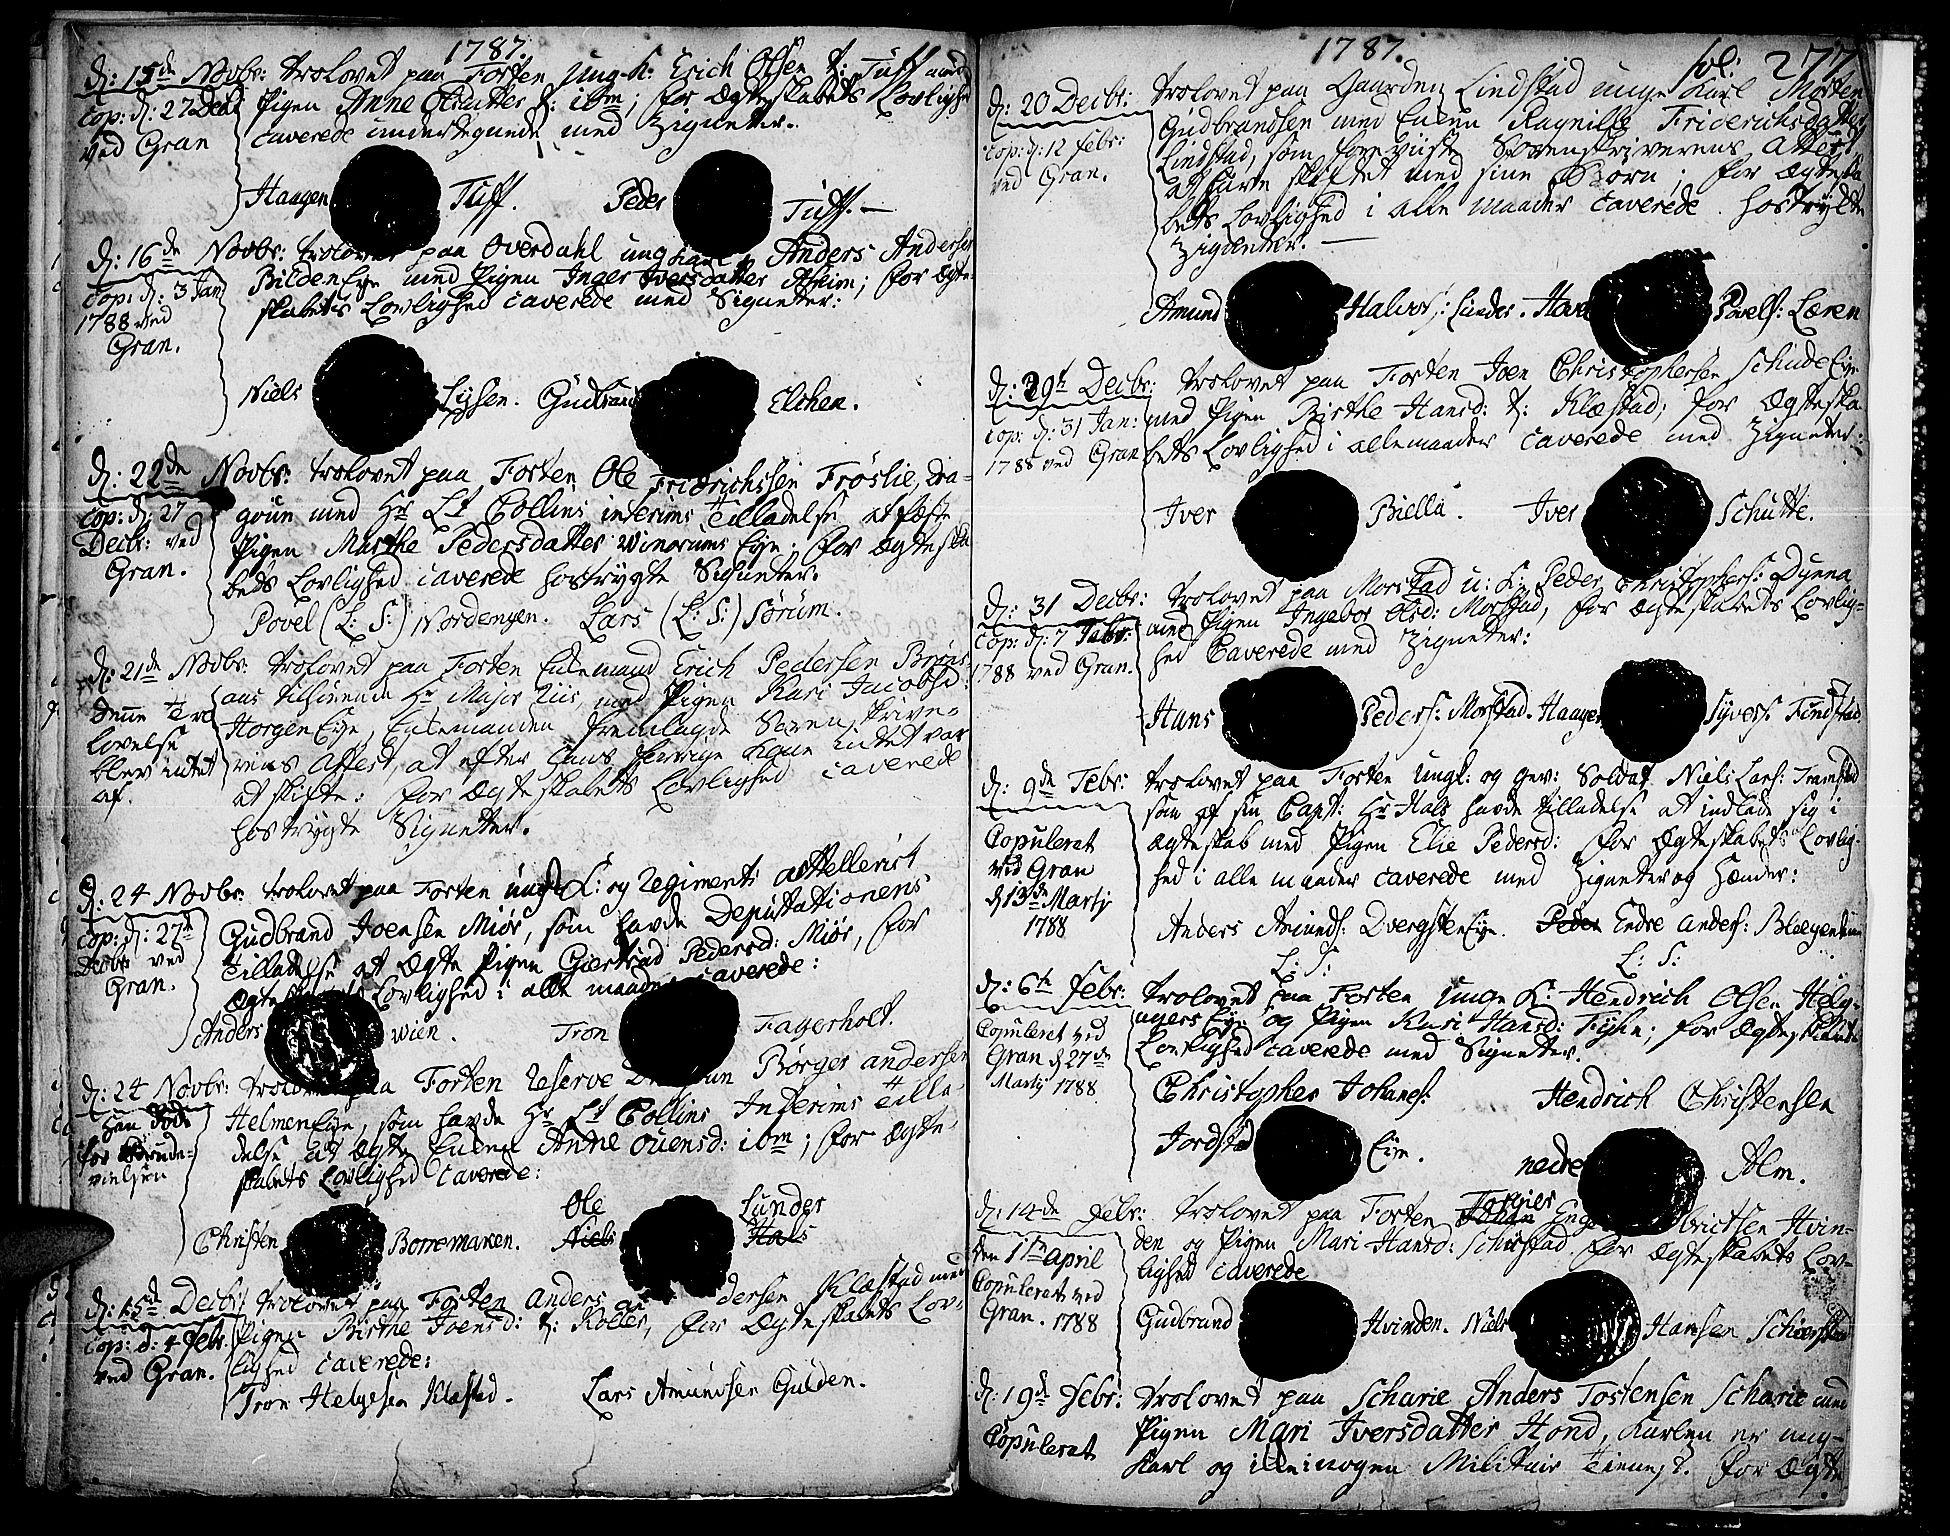 SAH, Gran prestekontor, Ministerialbok nr. 5, 1776-1788, s. 277